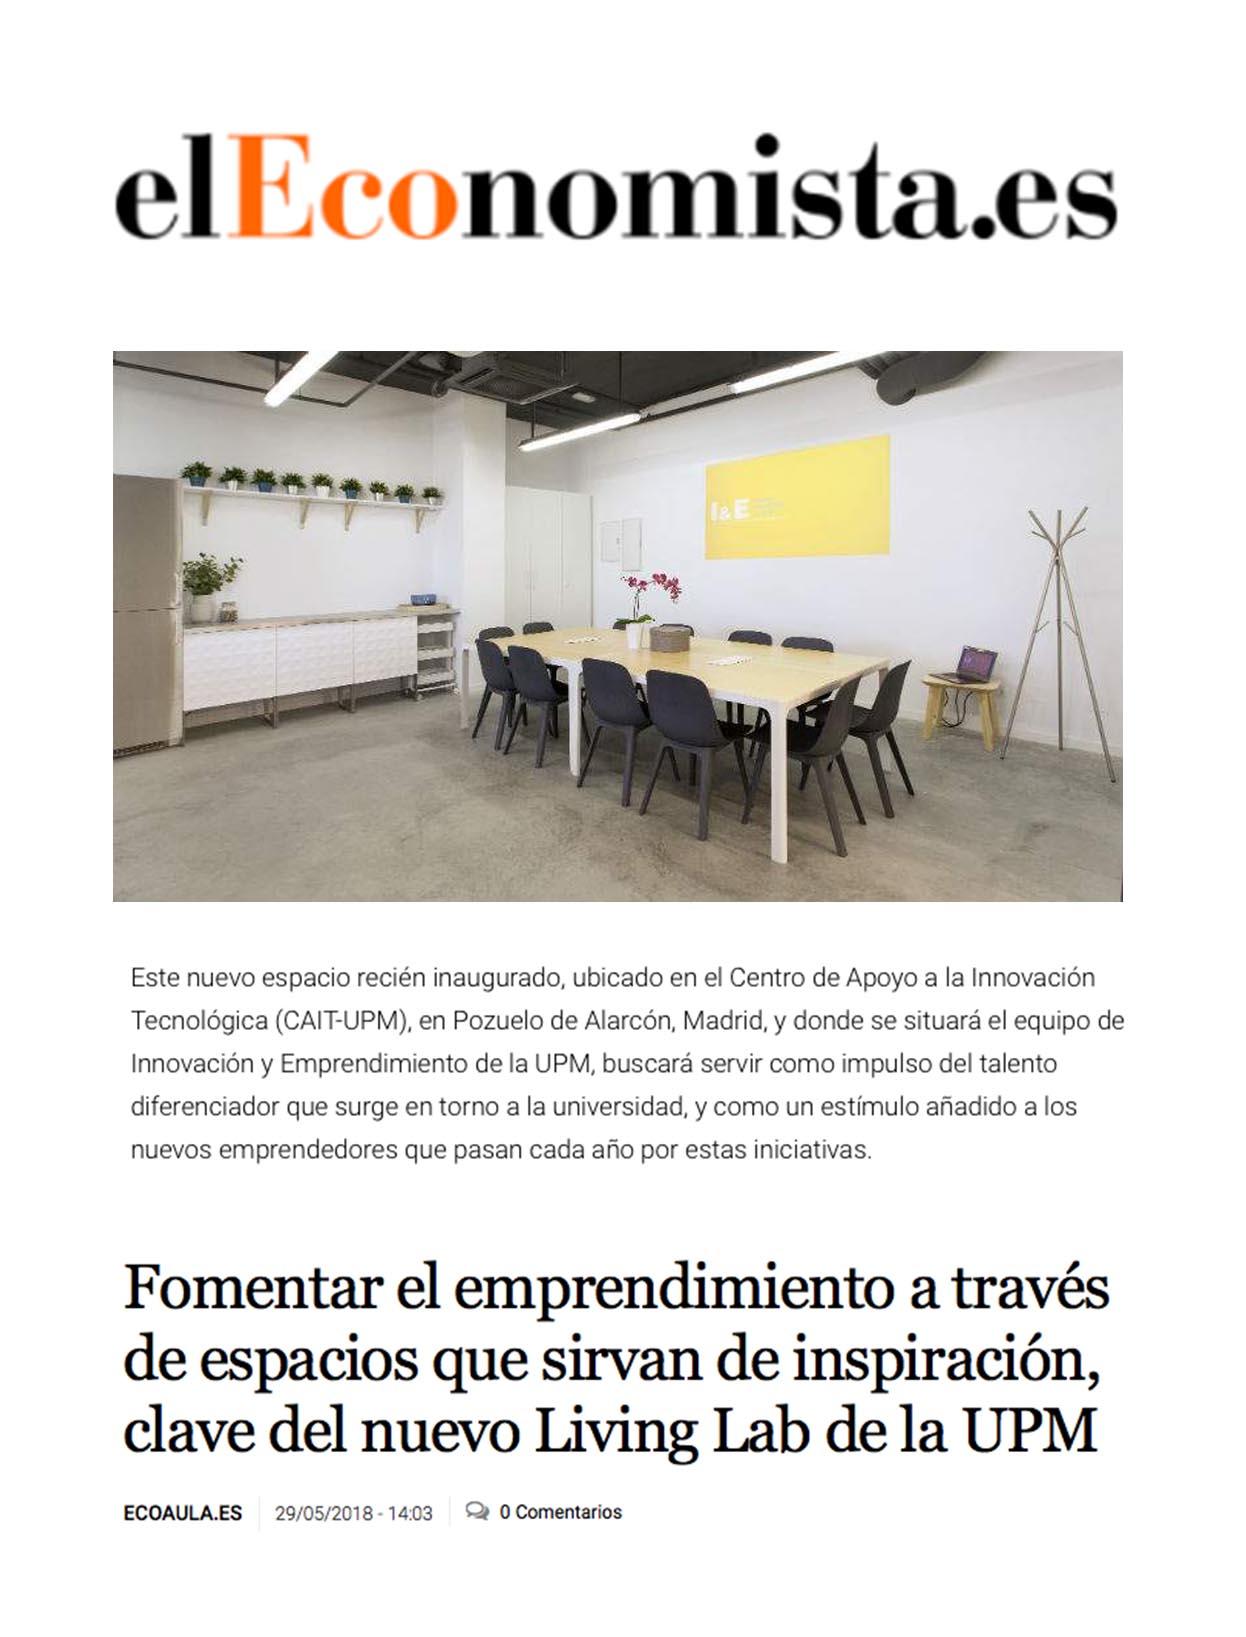 emmme studio economista reformas diseño slow prensa living lab.jpg